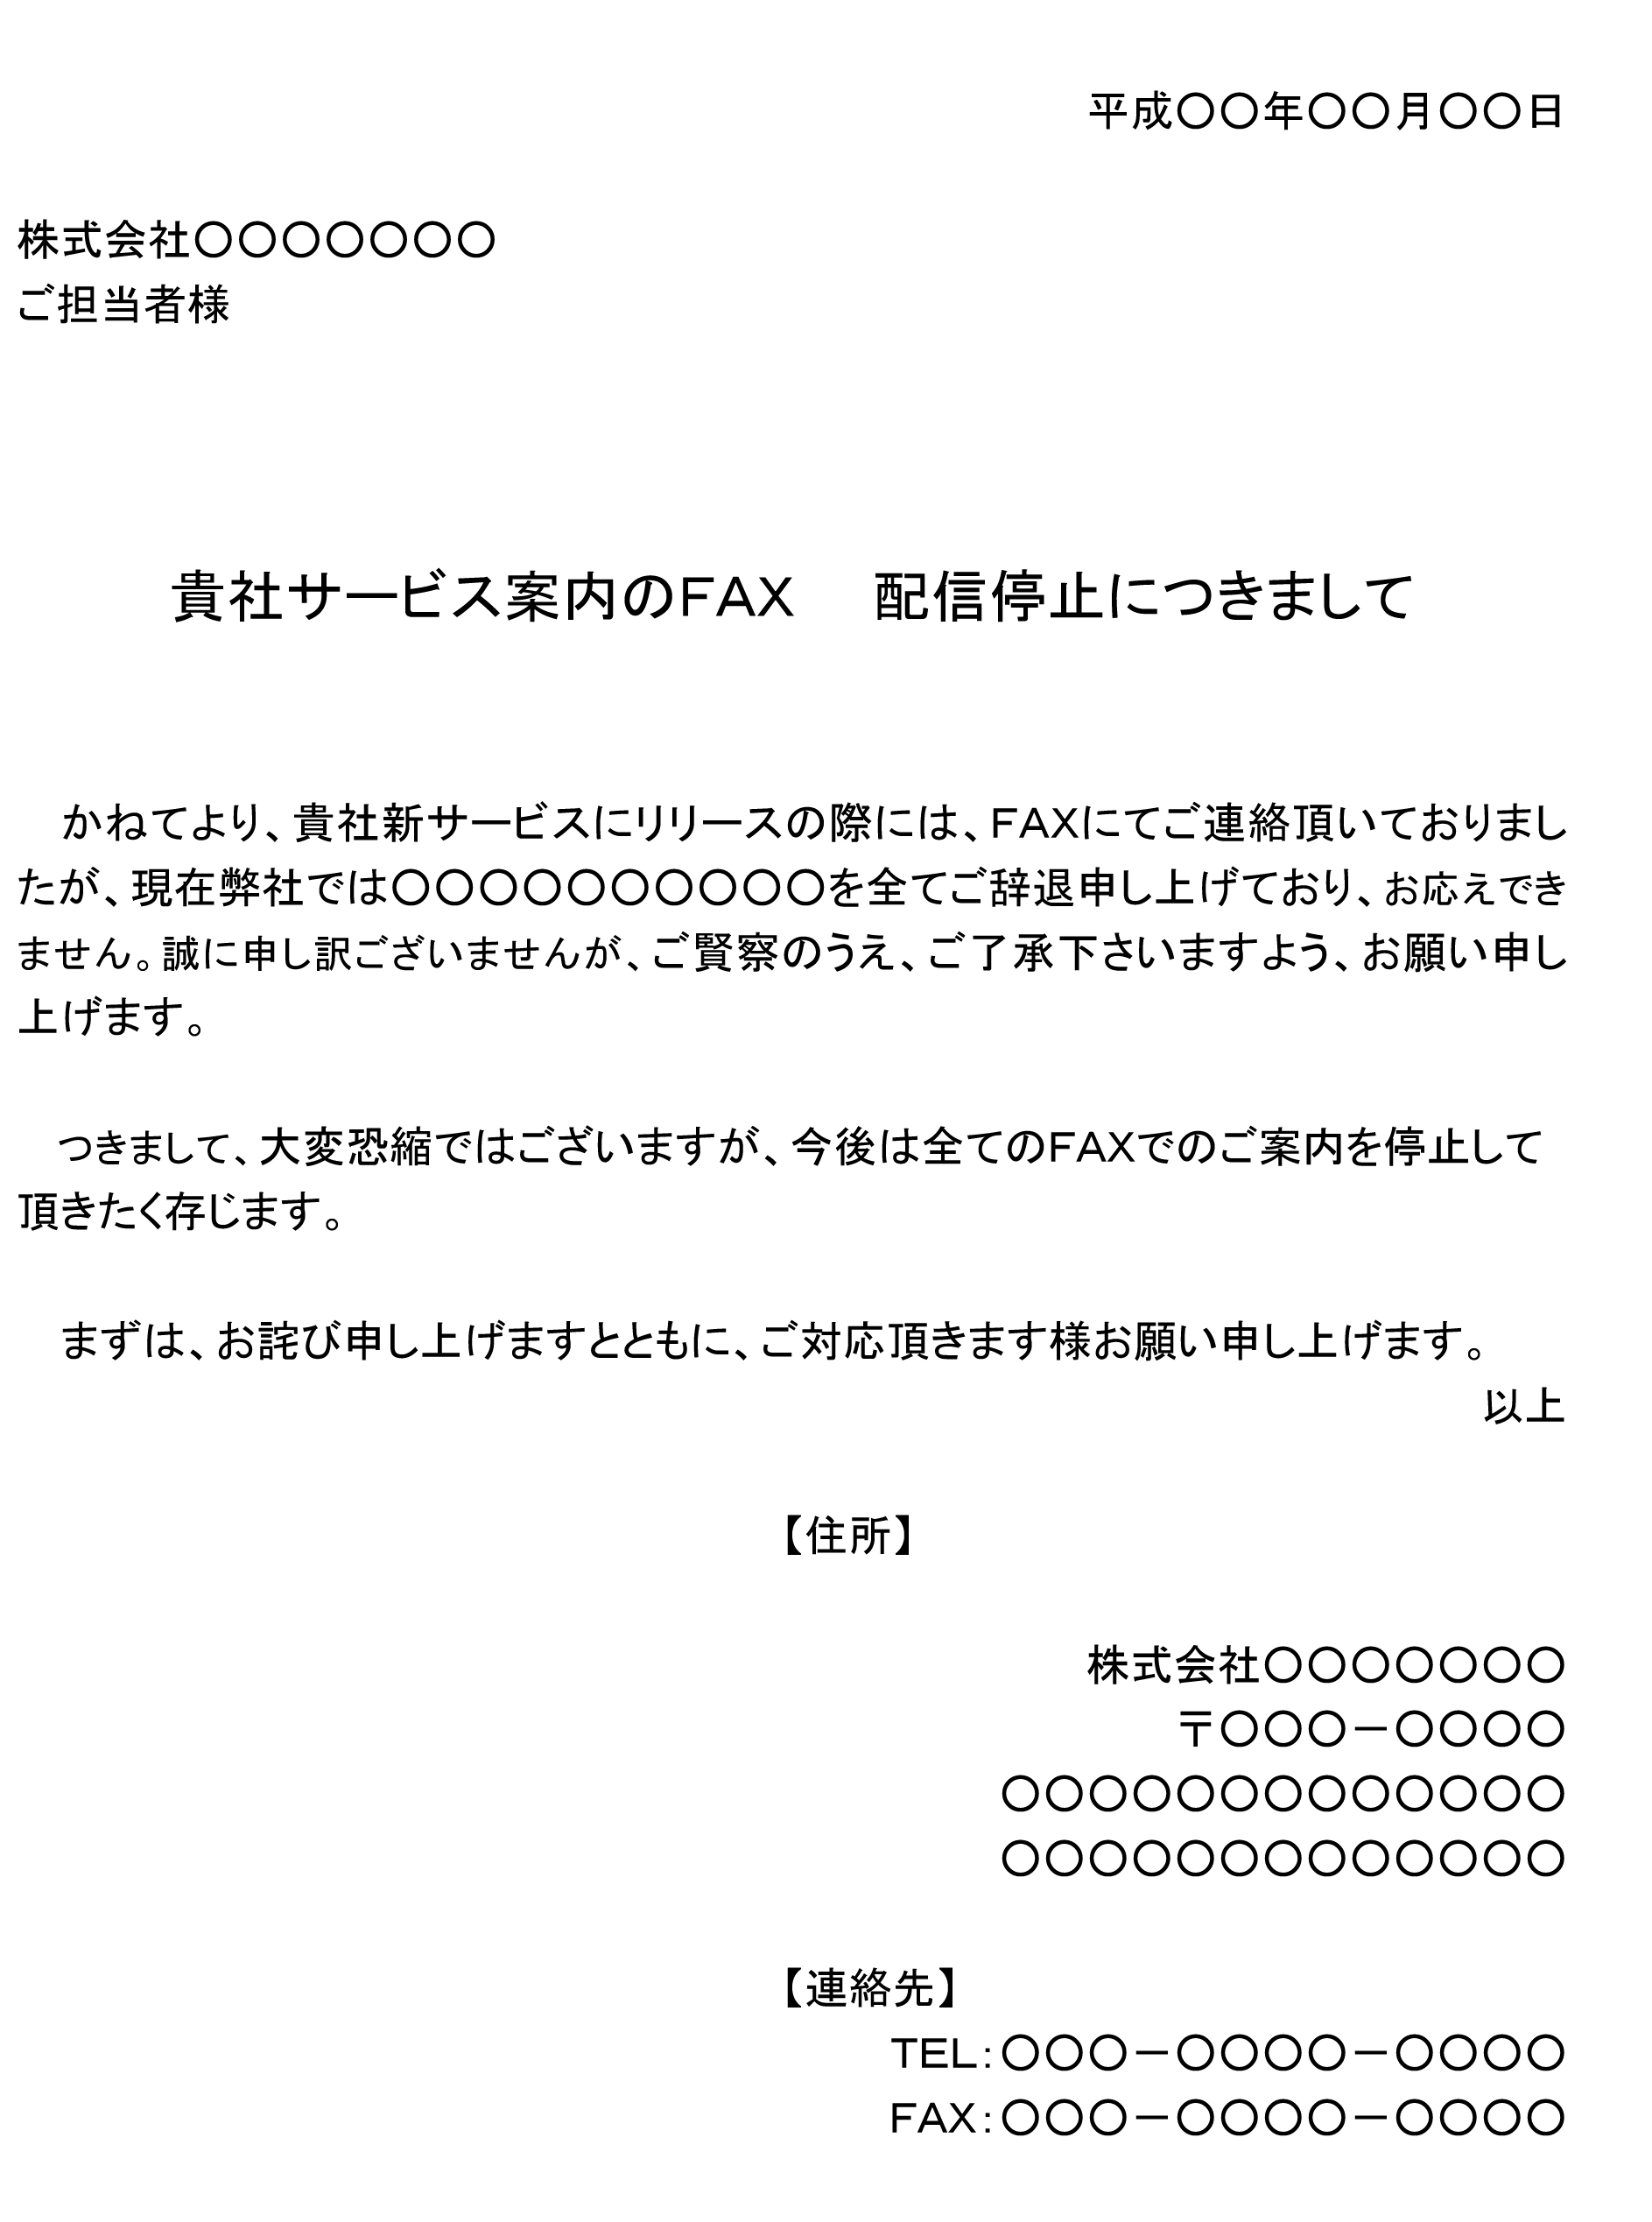 断り状(FAX配信停止)01